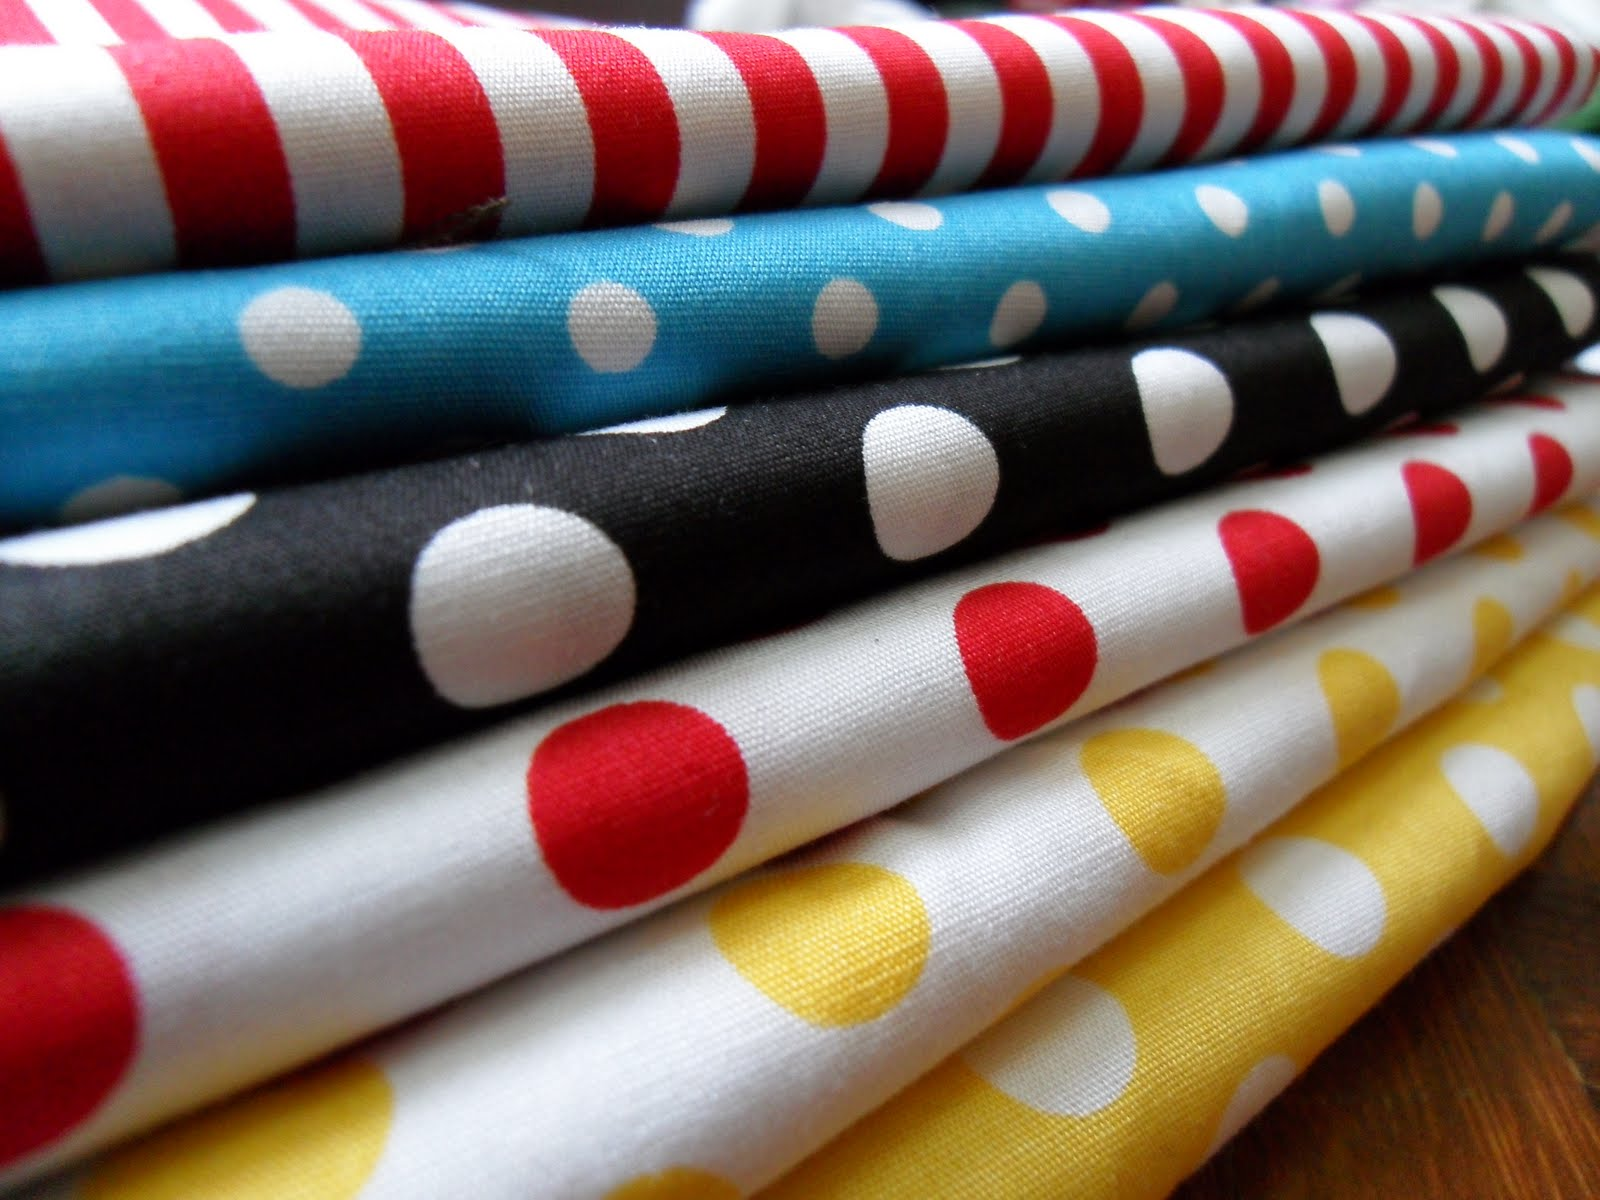 Llbean Wikipedia >> Dot Cotton Images | FemaleCelebrity